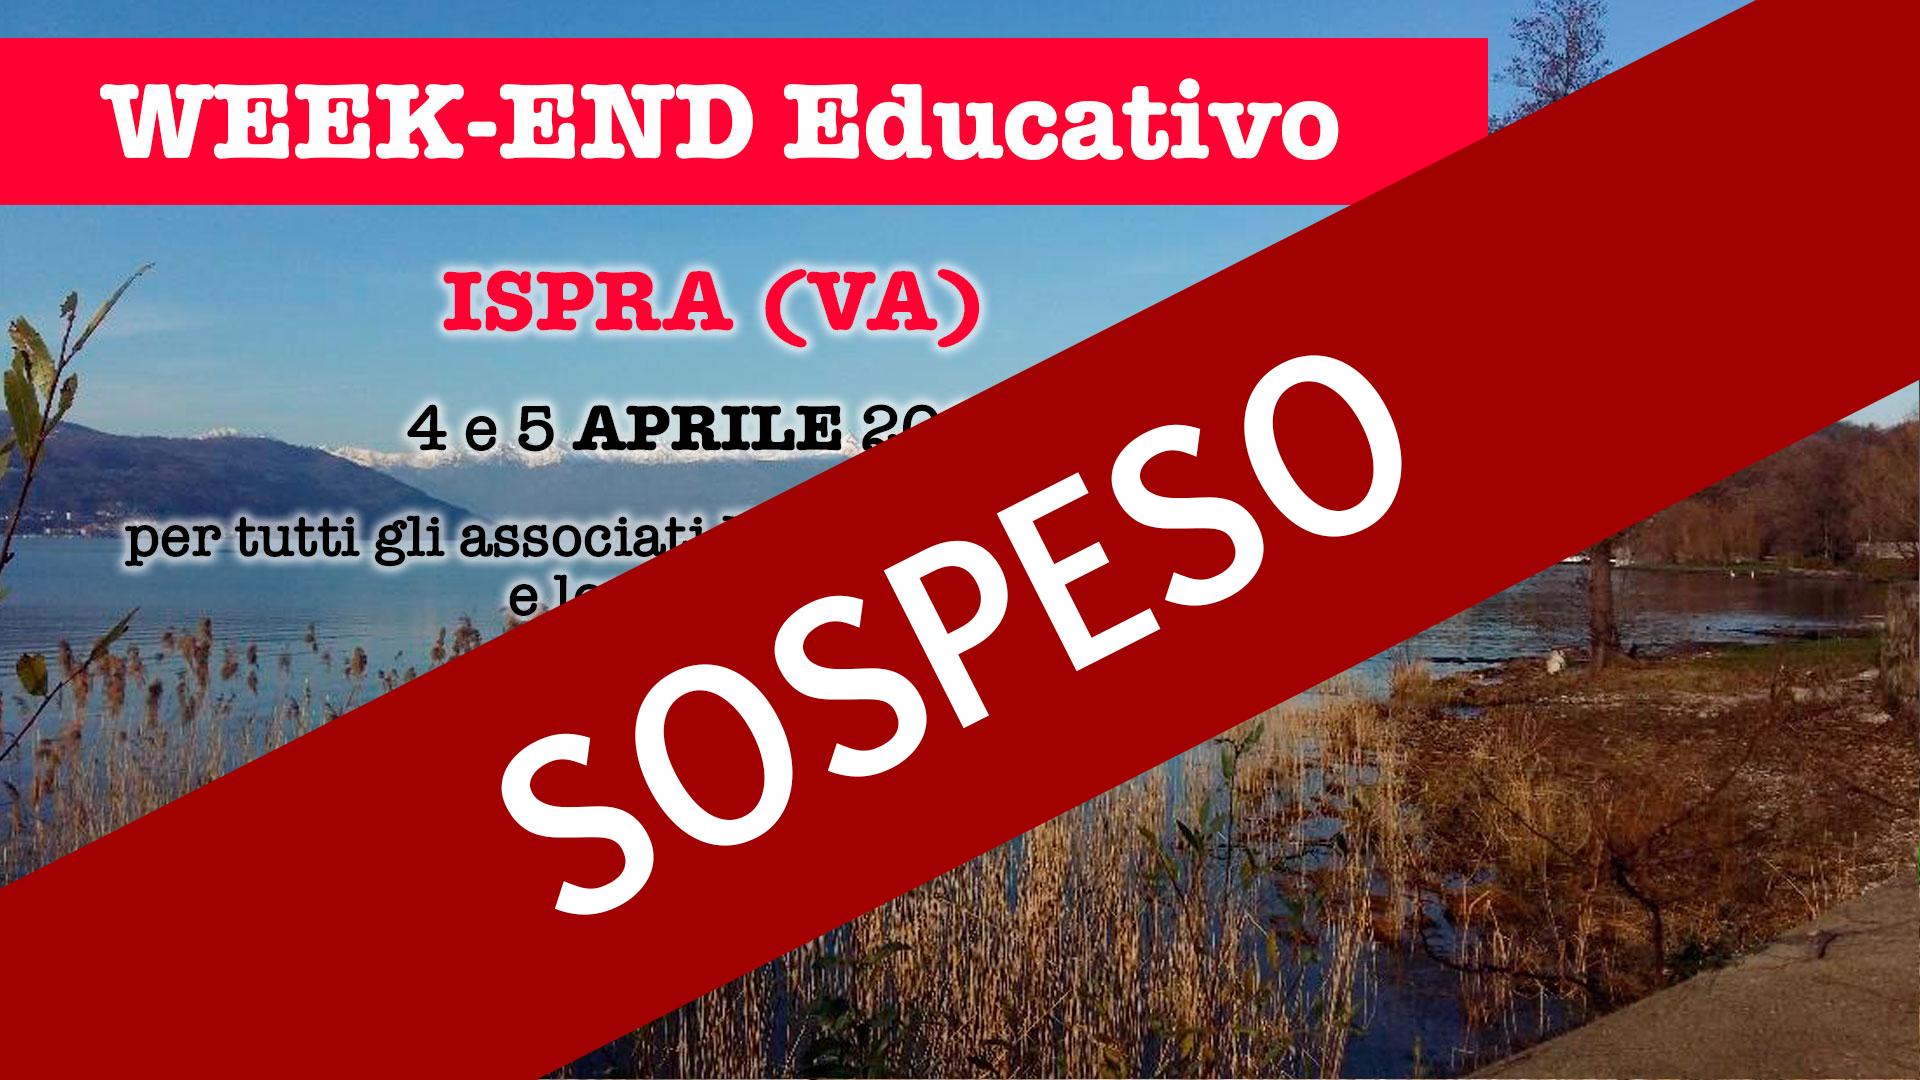 4-5 APR 2020 - Week-end Educativo - Ispra (VA)